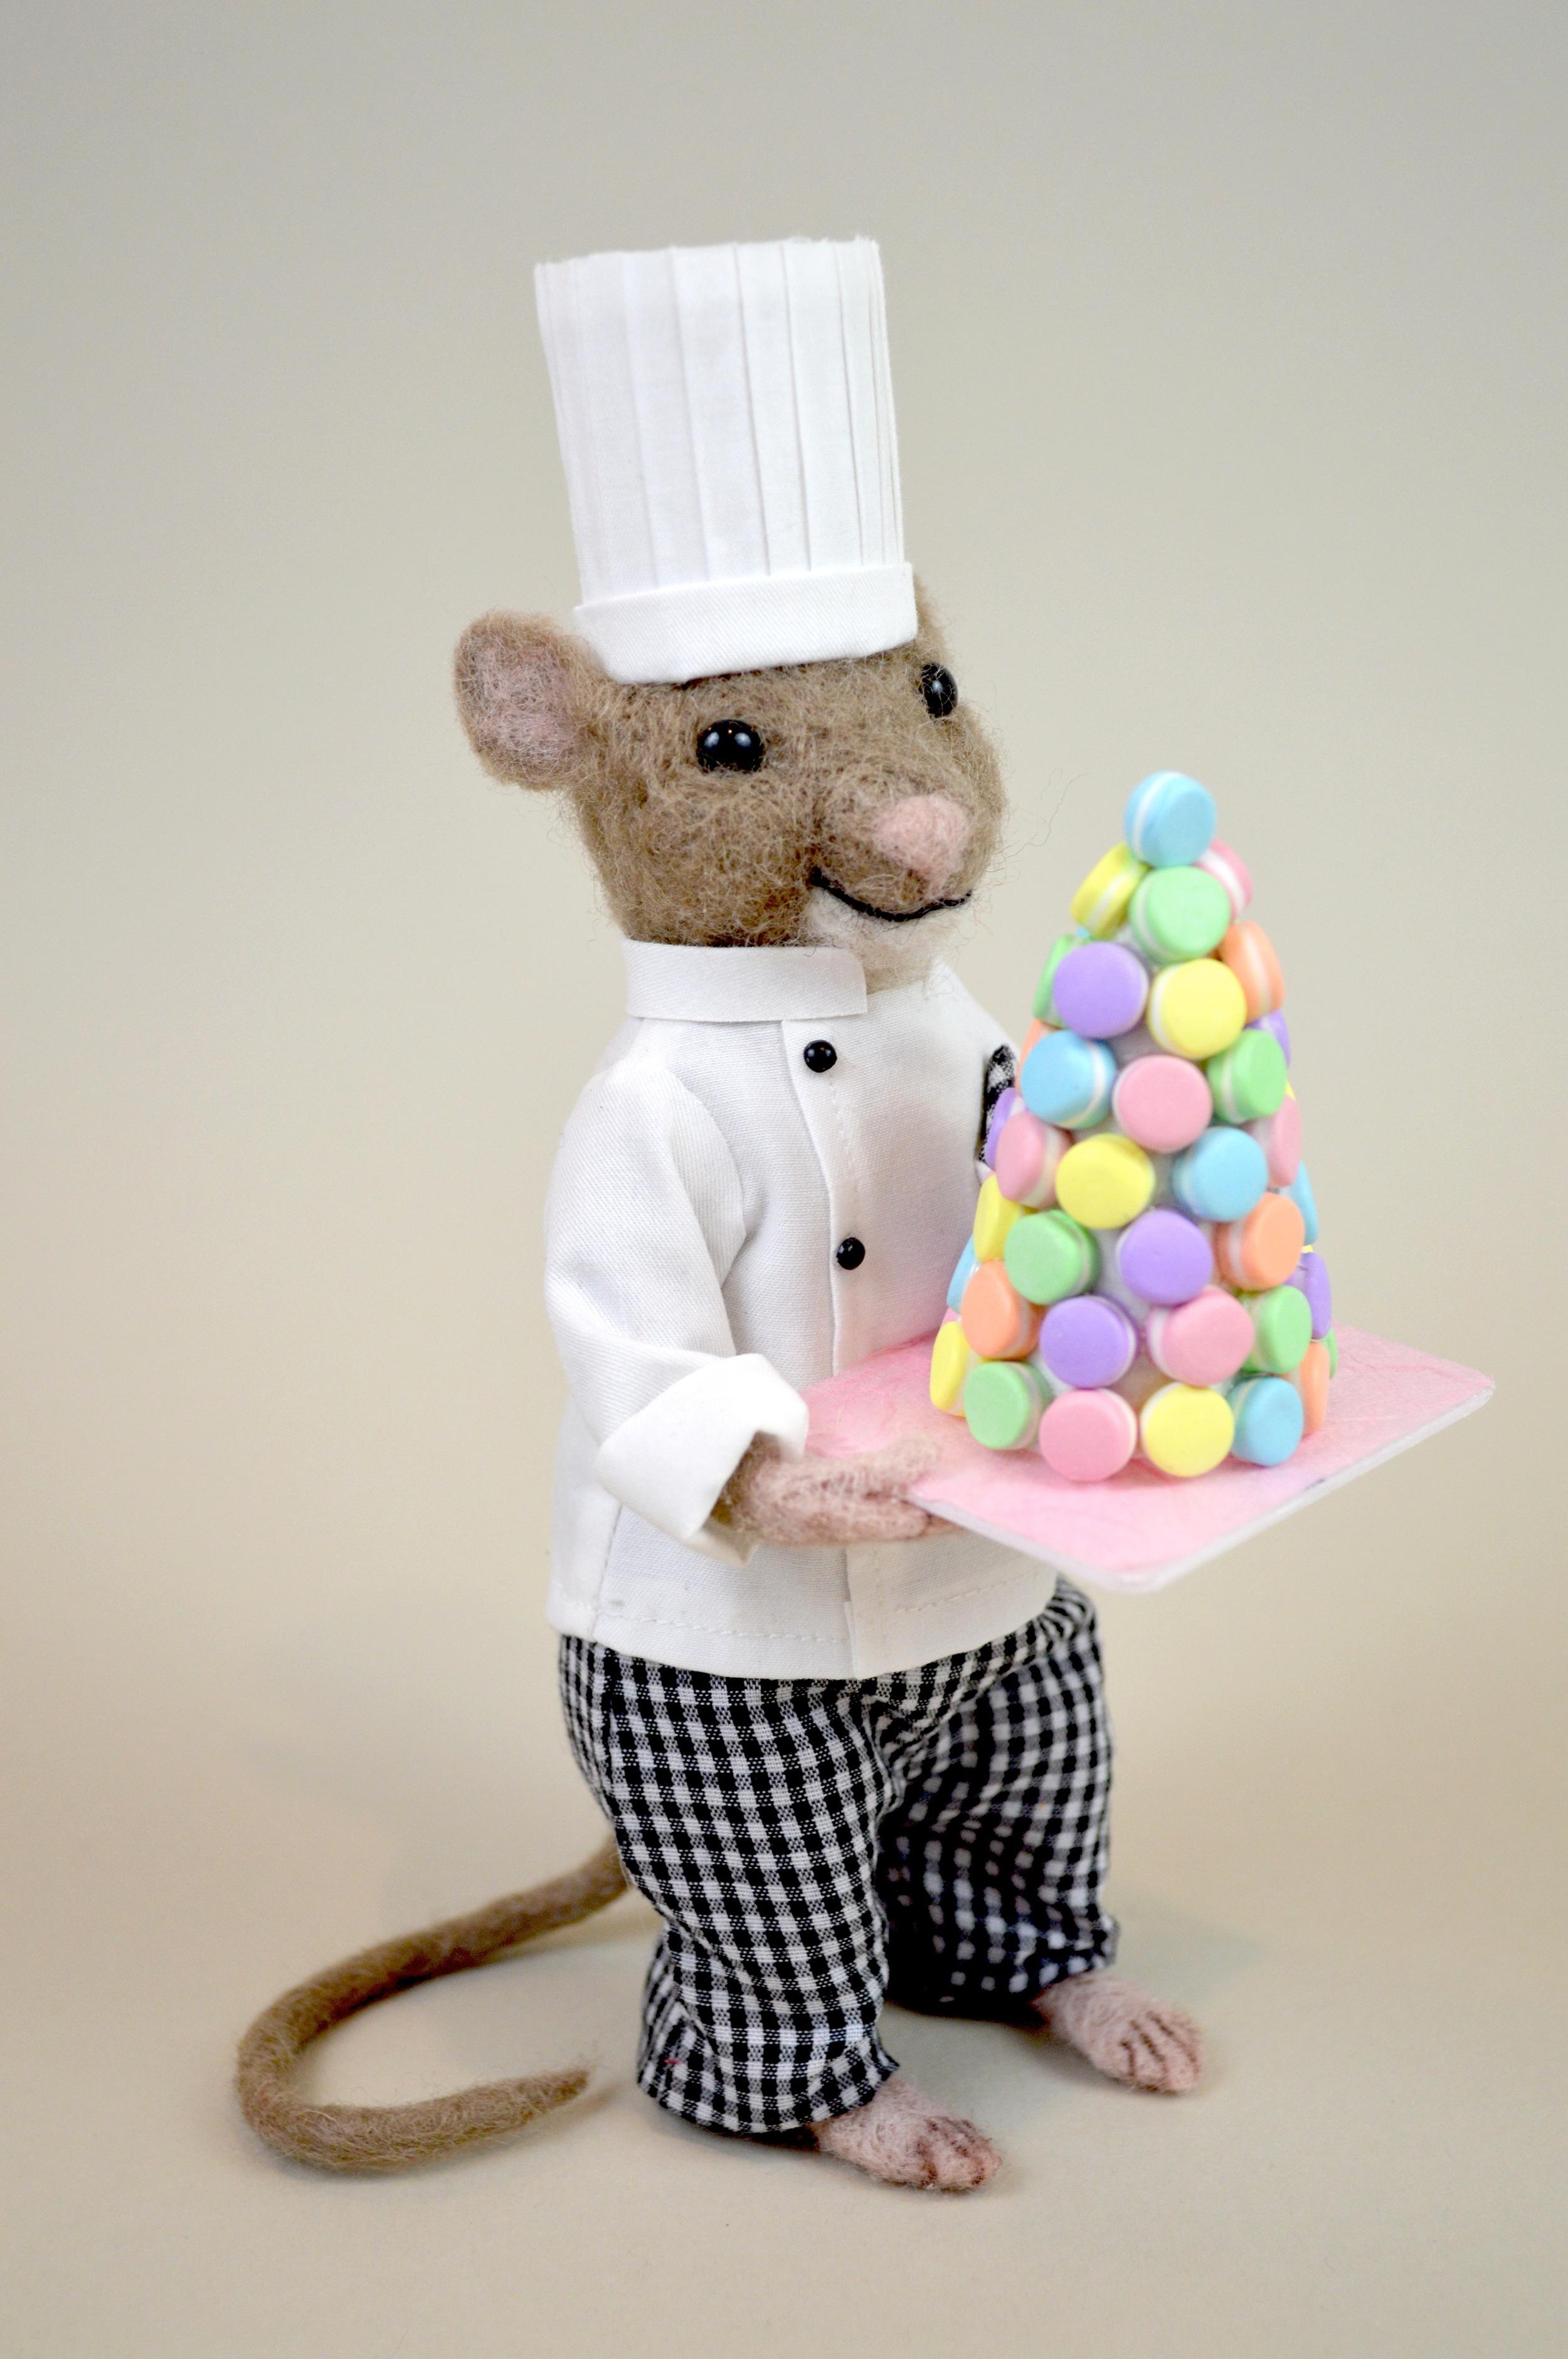 Chef Nibbles